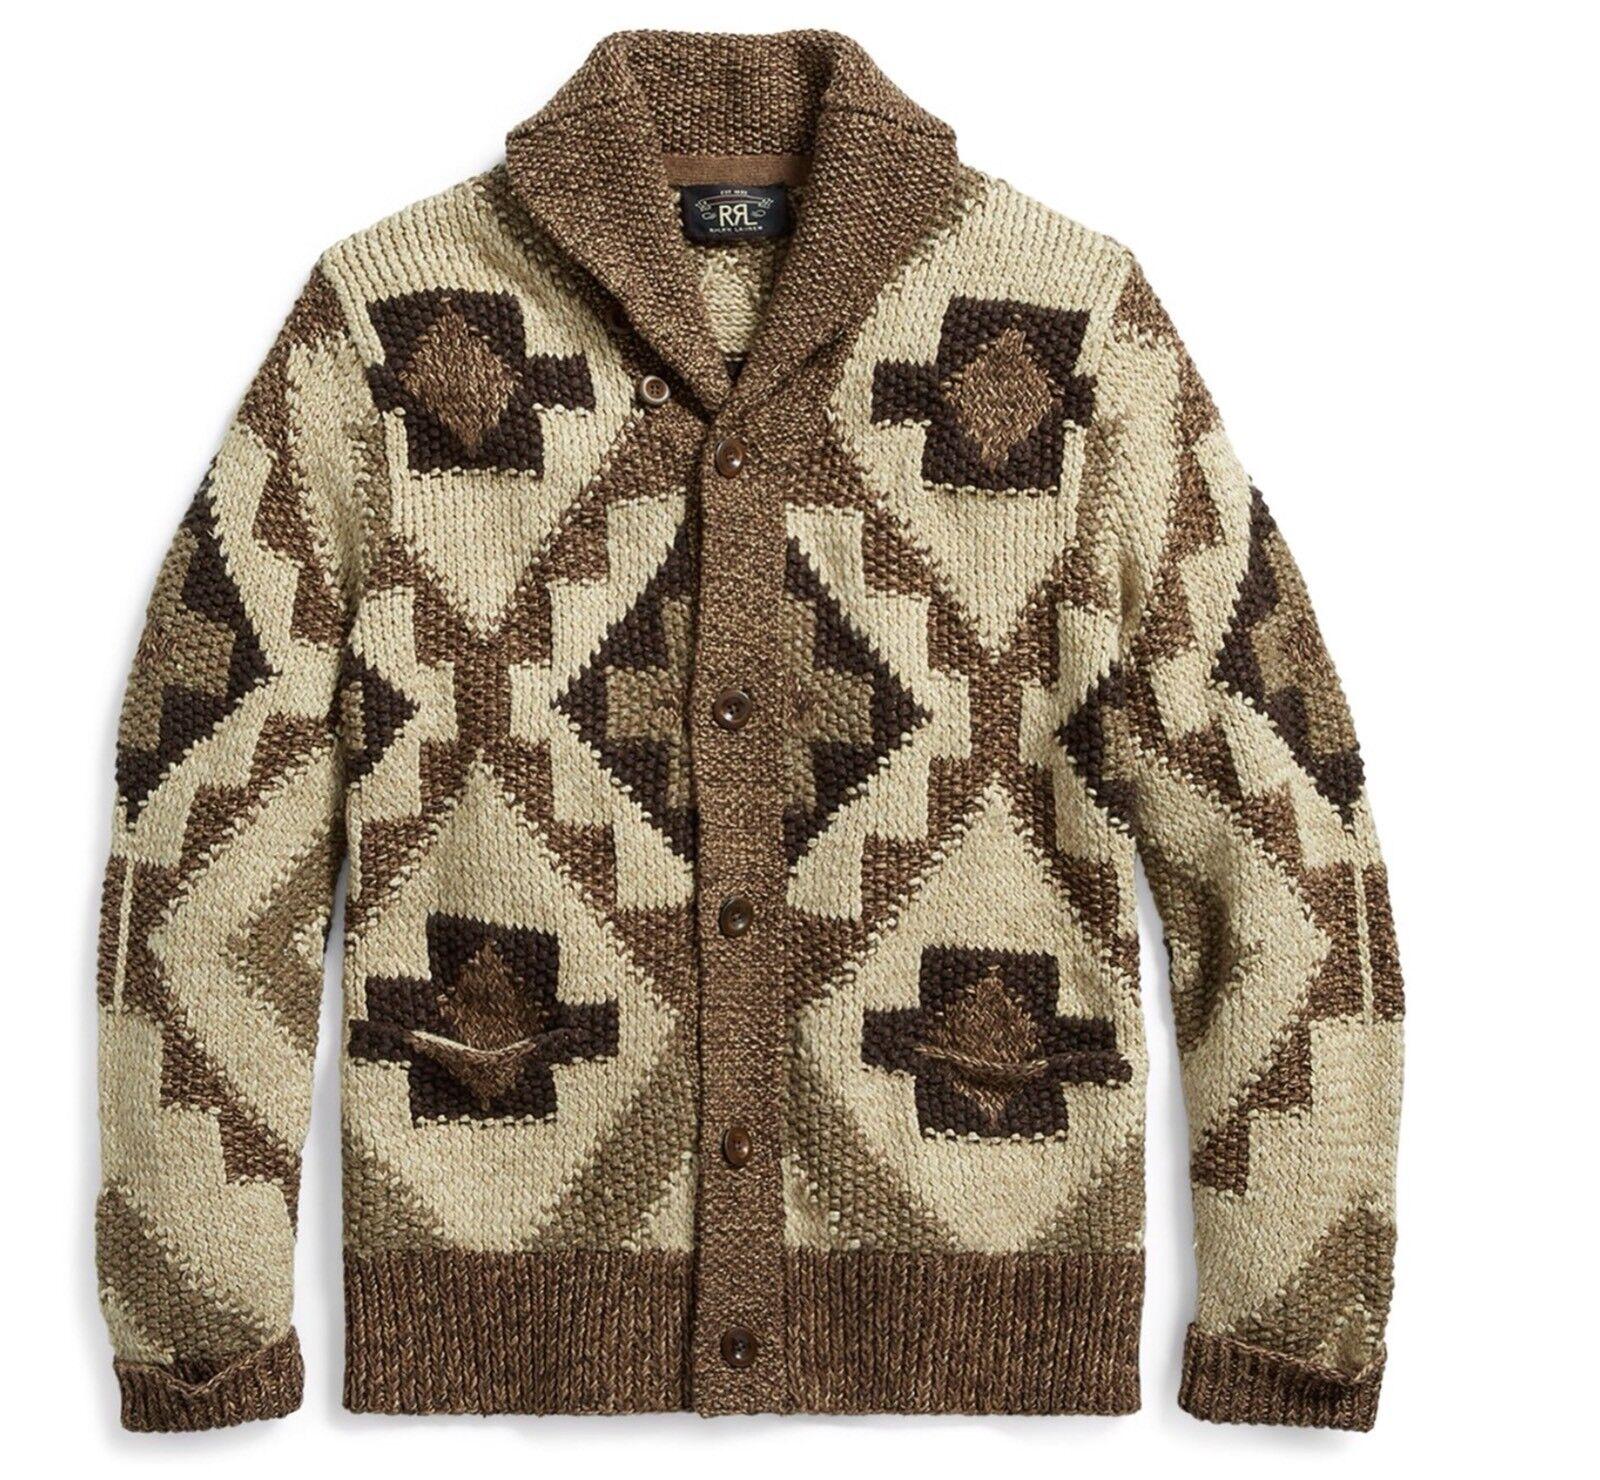 RRL Ralph Lauren Vintage Inspired Hand Knit Cotton Linen Blend Cardigan-L